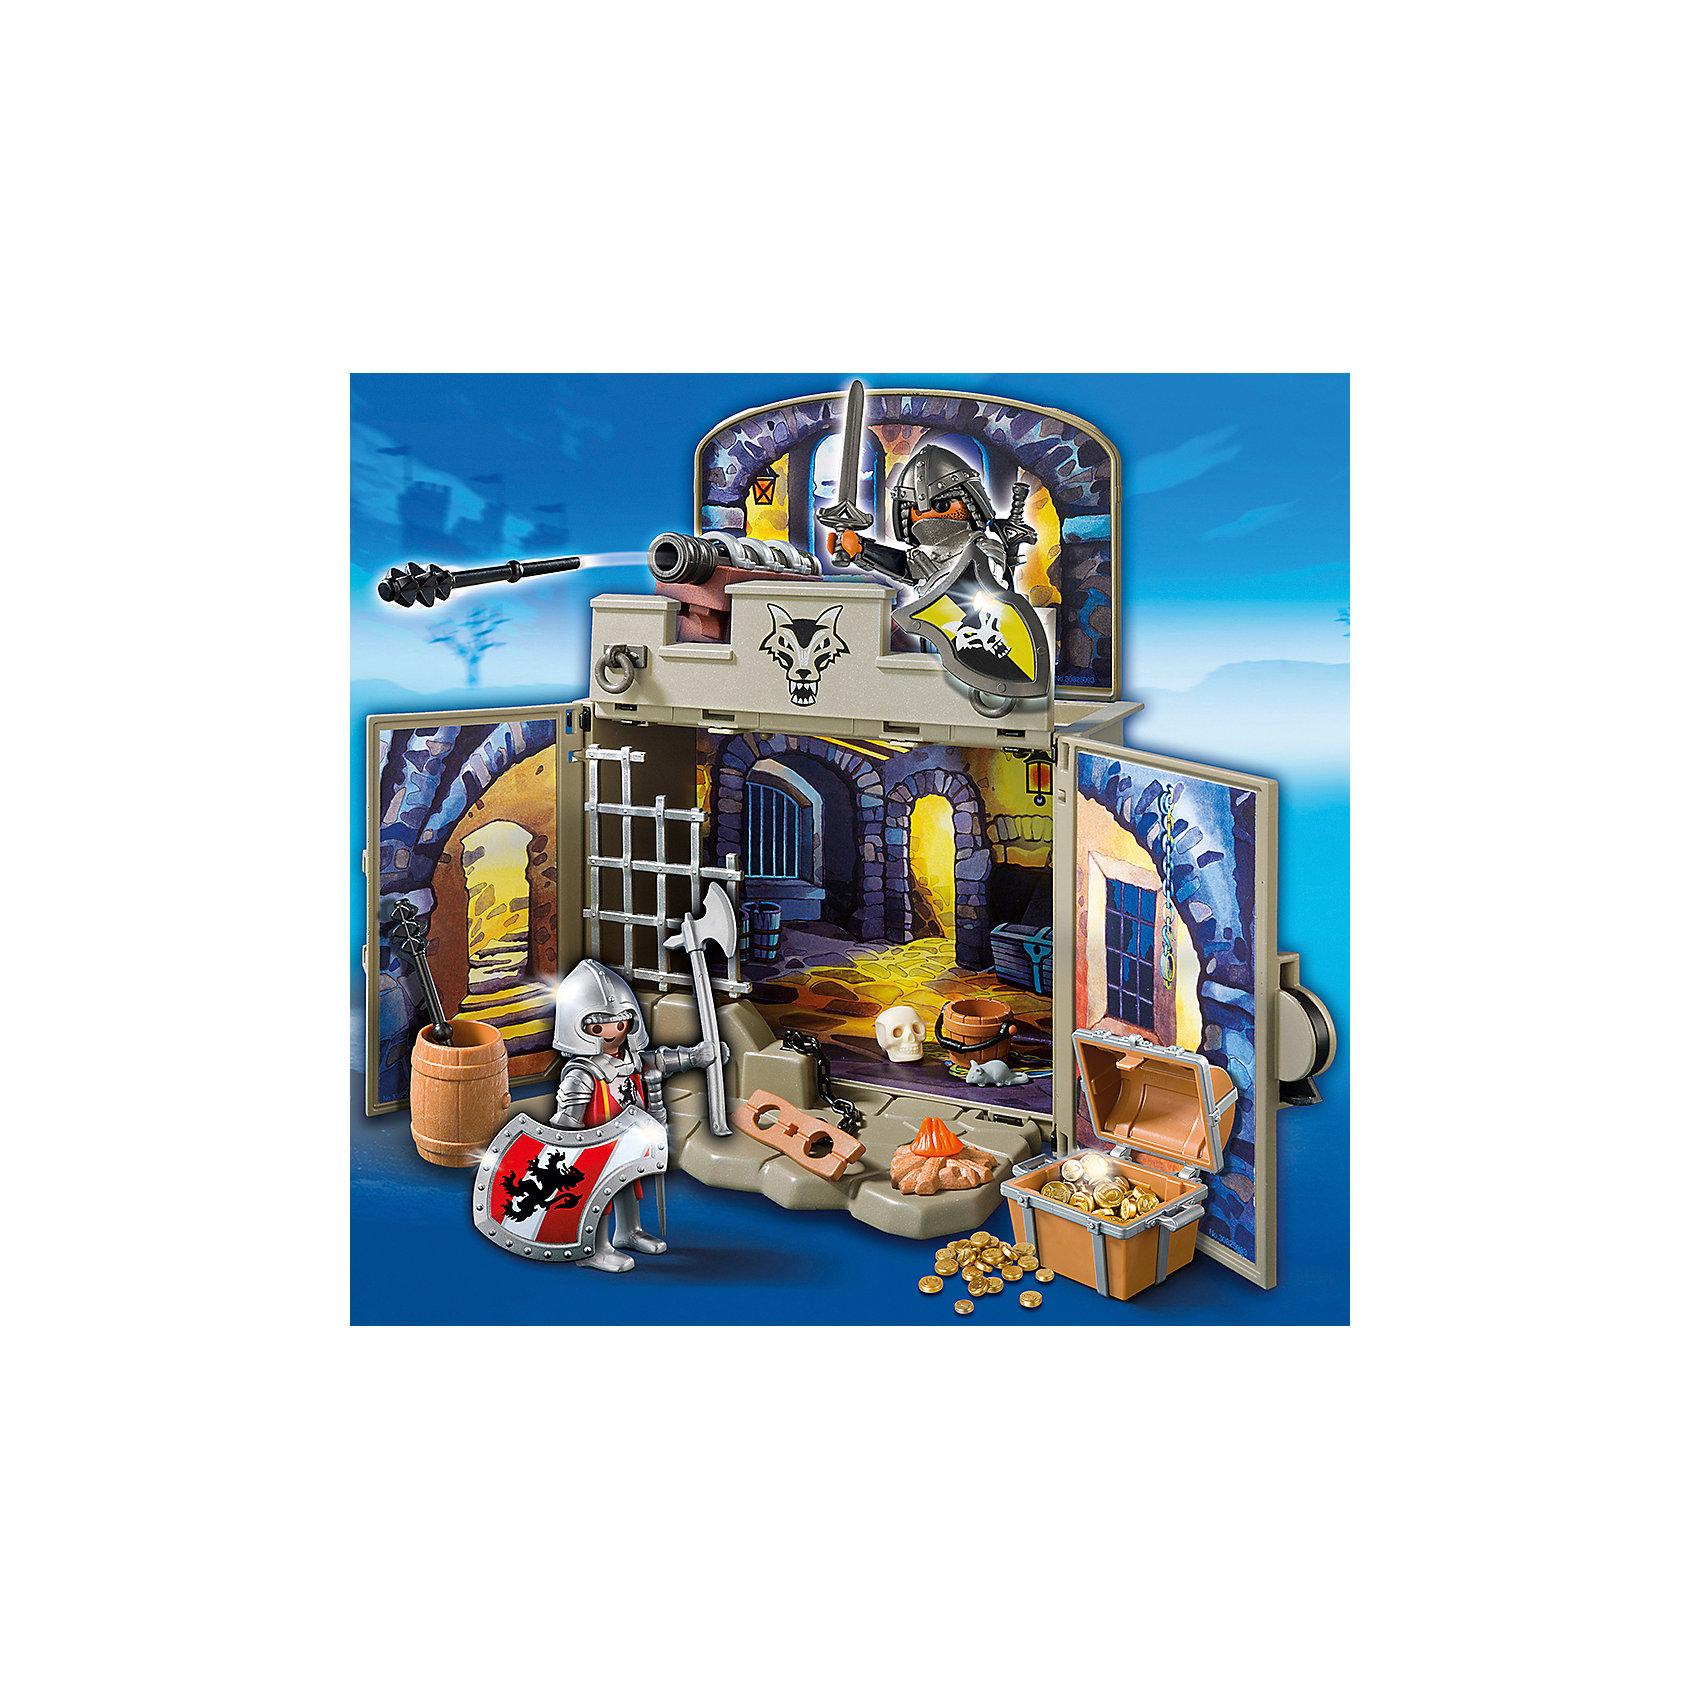 PLAYMOBIL® Возьми с собой: Сокровищница рыцарей, PLAYMOBIL playmobil® возьми с собой пляжное бунгало playmobil